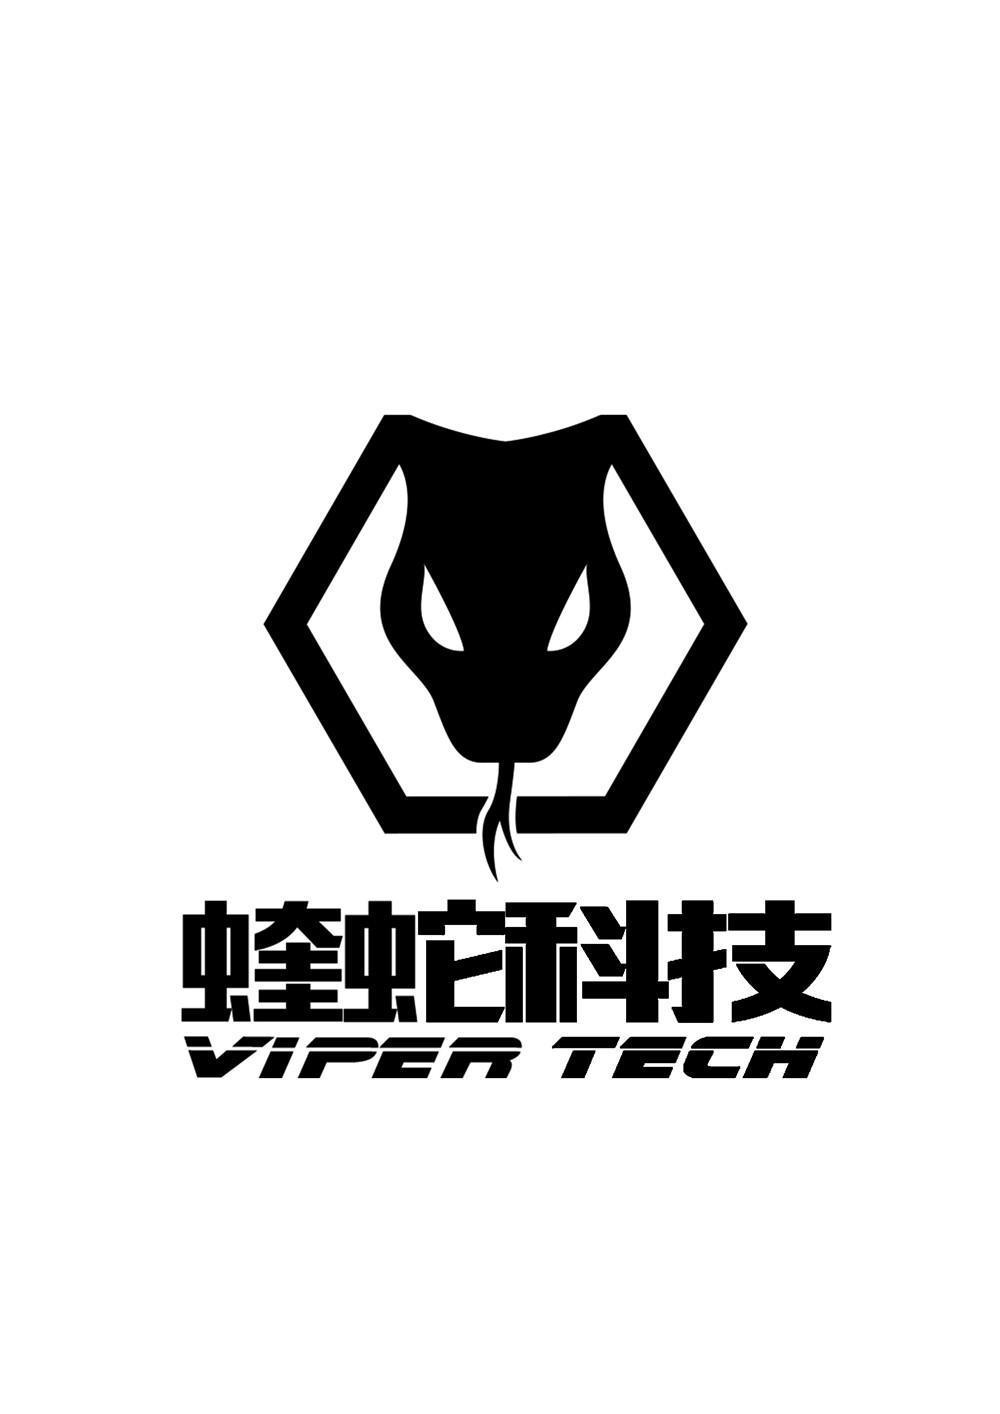 logo logo 标志 设计 矢量 矢量图 素材 图标 1000_1414 竖版 竖屏